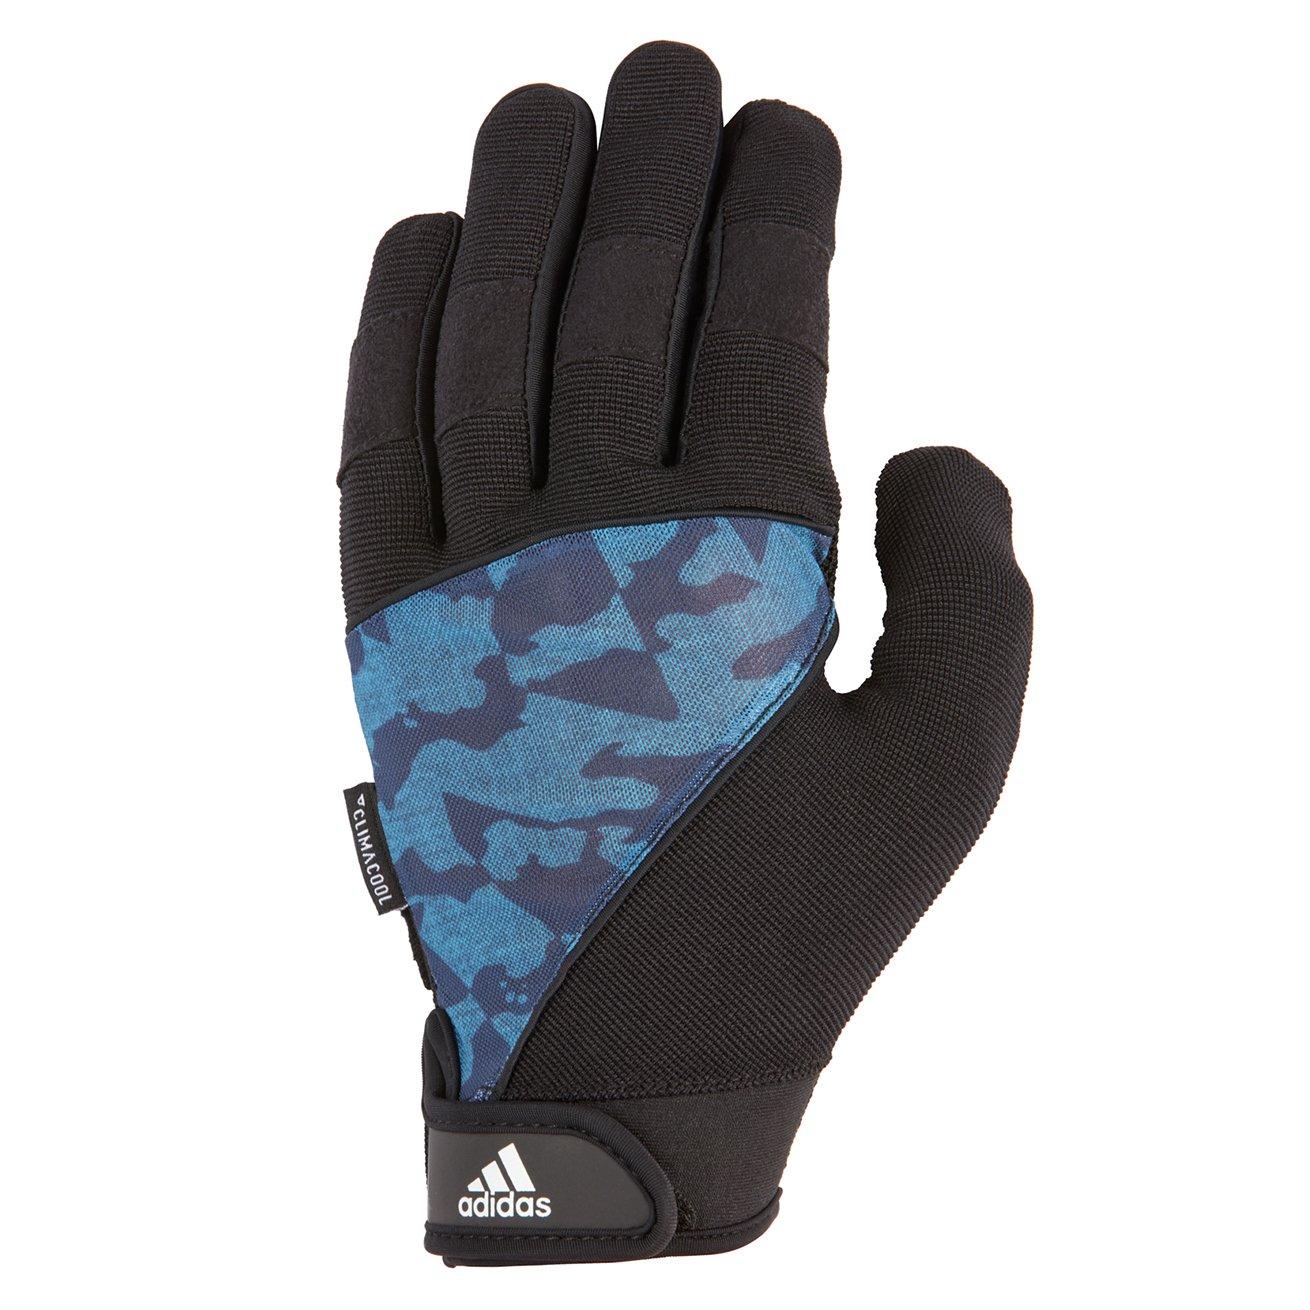 Adidas Full Fingerパフォーマンスグローブ – 迷彩、ミディアム B073JPCP3V